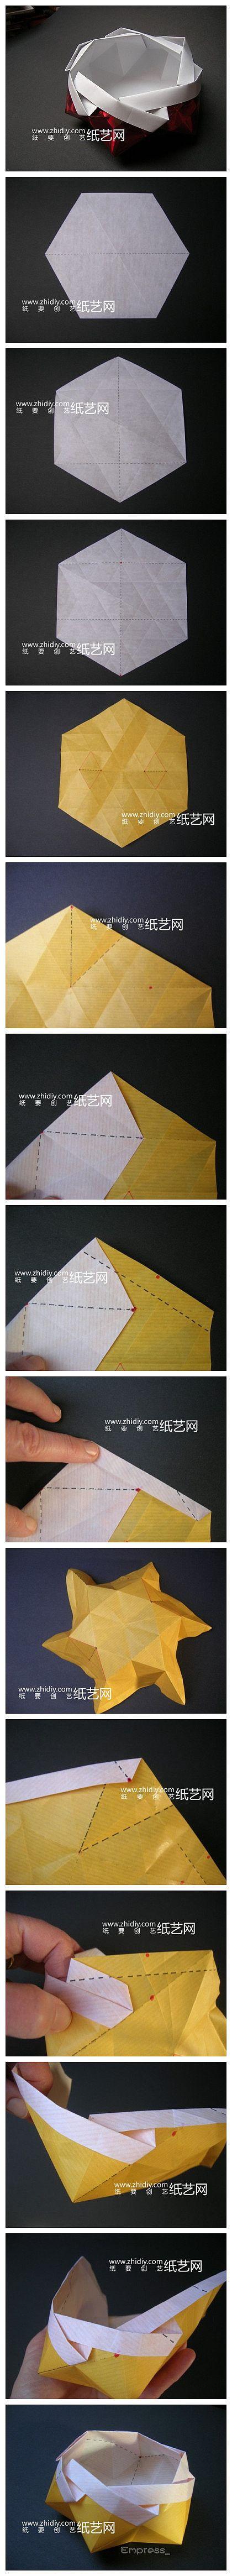 The Japanese origami origami tutorial storage box ~